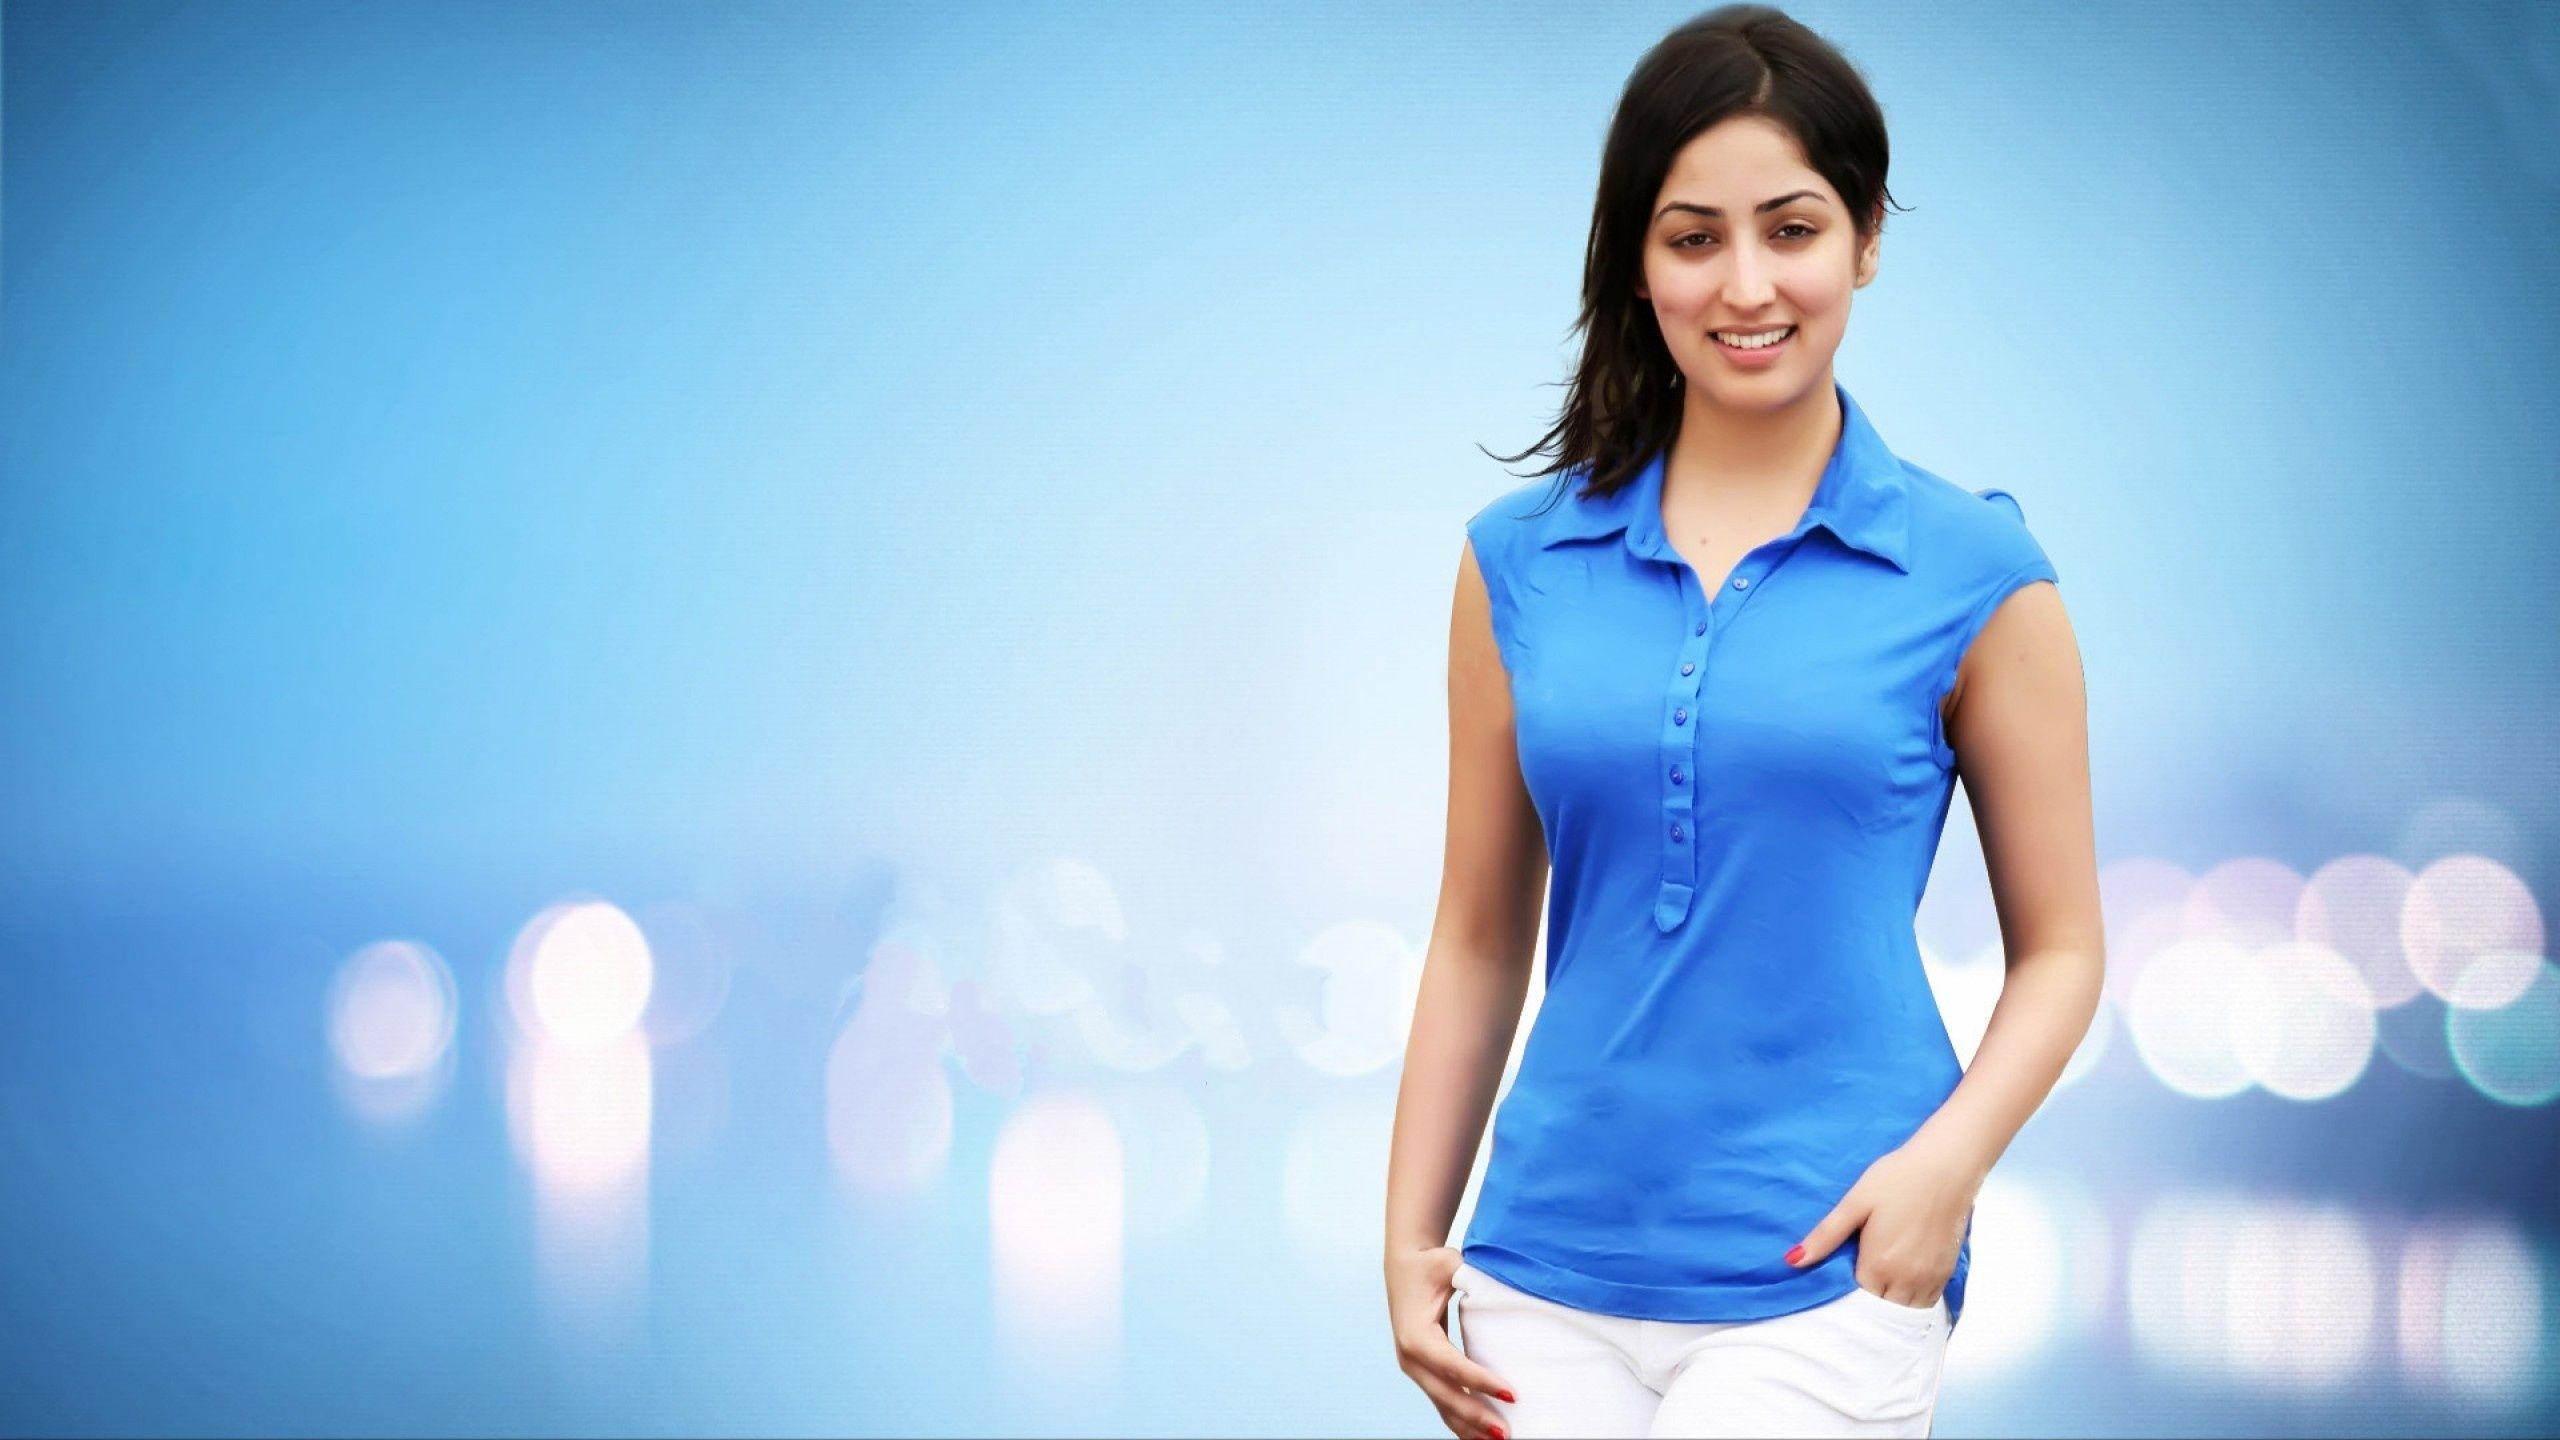 Wallpaper download hd girl - Yami Gautam Woman Girl Full Hd Hot Wallpaper Free Download Yami